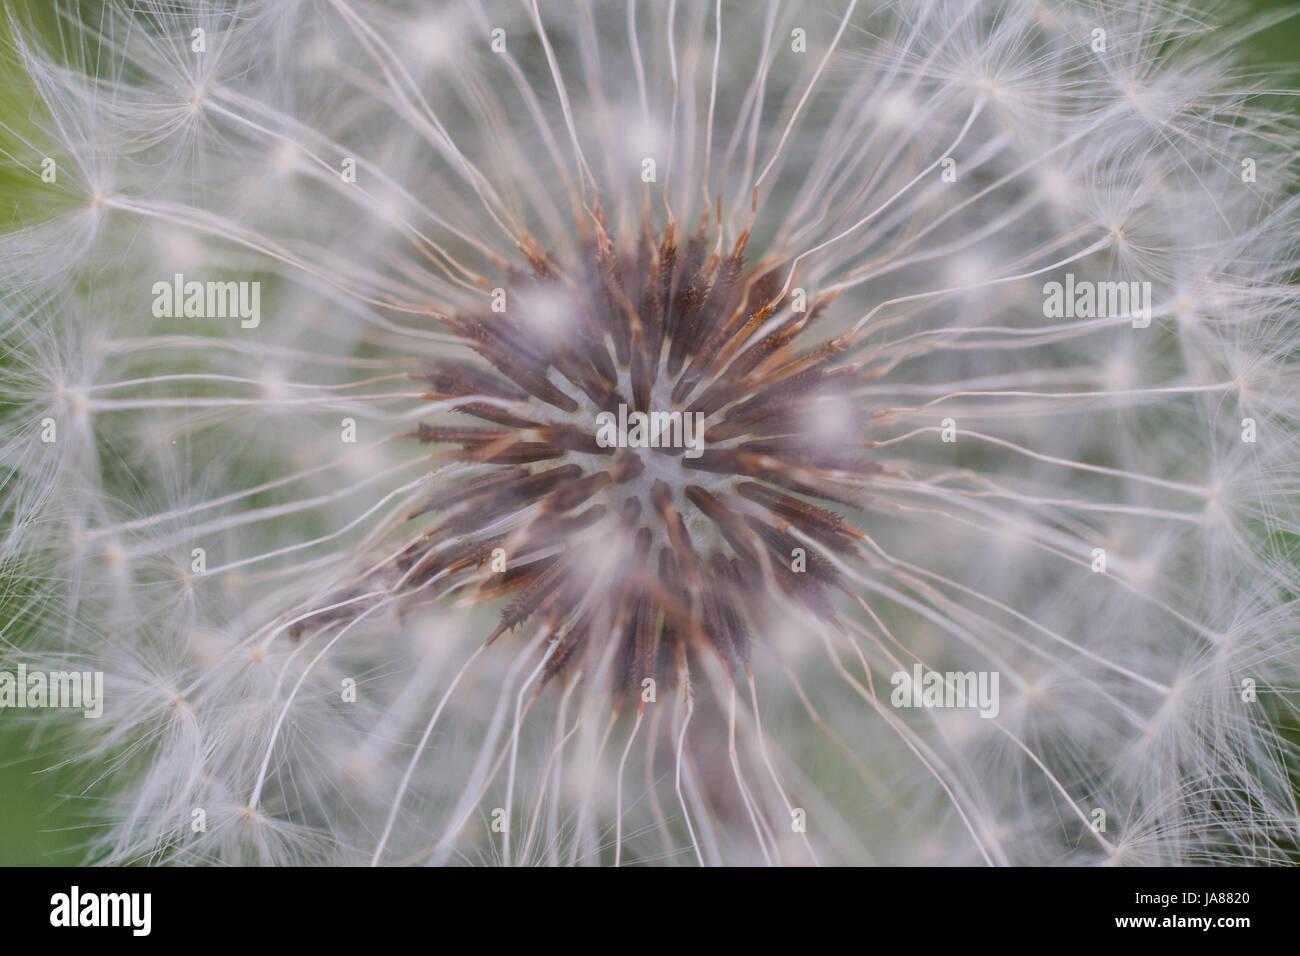 Closeup Dandelion Capitulum - Stock Image